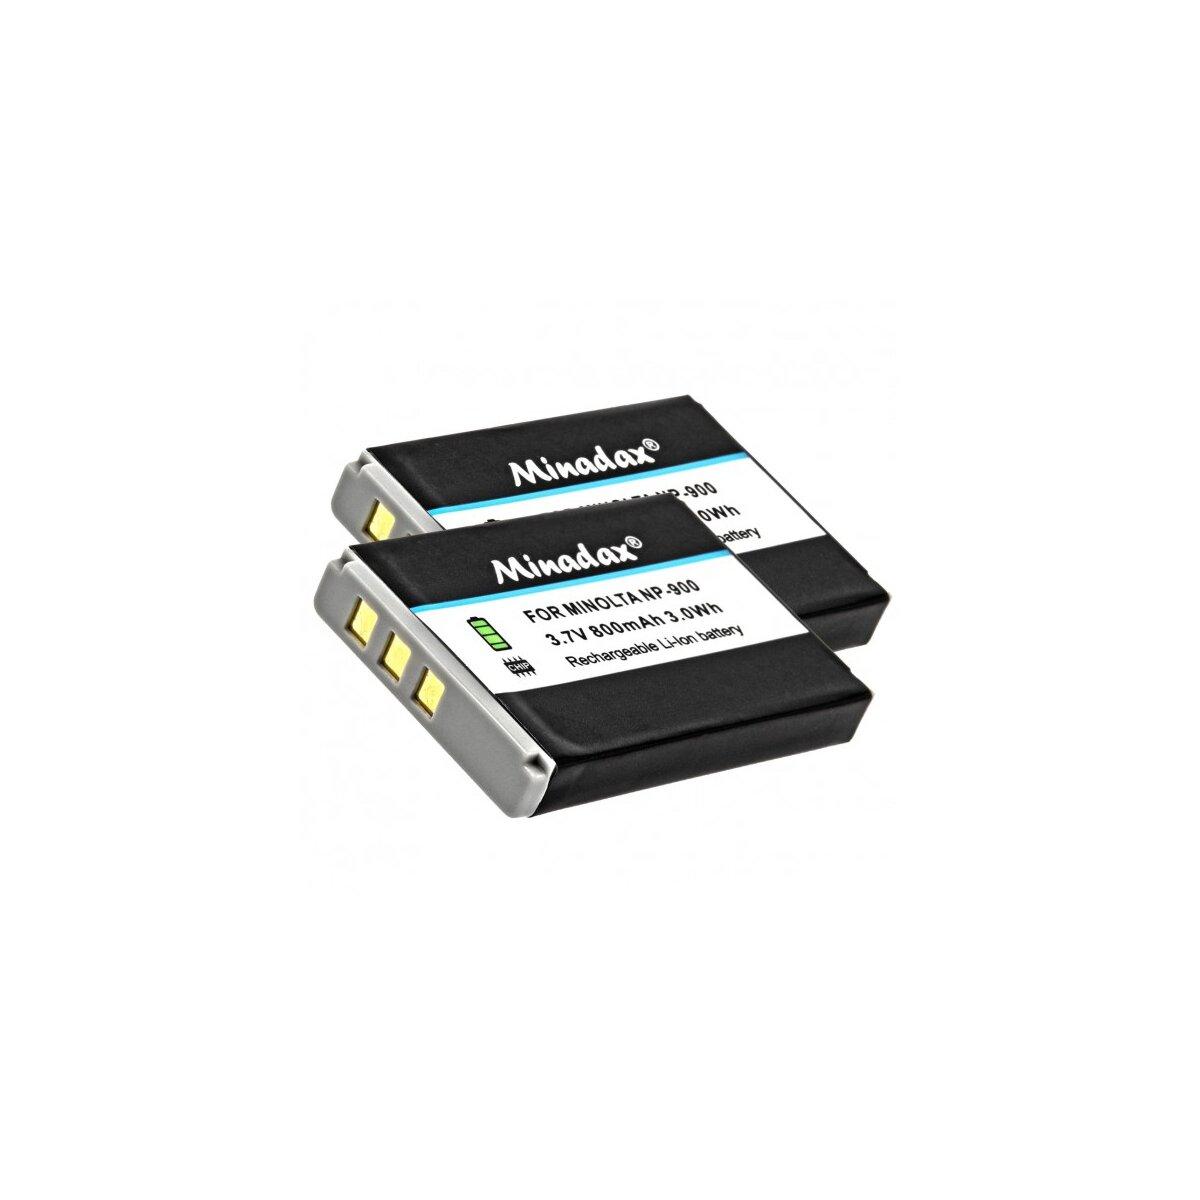 2x Minadax® Qualitaetsakku mit echten 800 mAh fuer Minolta E40, E50, D4, Aldi-X5, Np-900, wie NP-900 - Intelligentes Akkusystem mit Chip